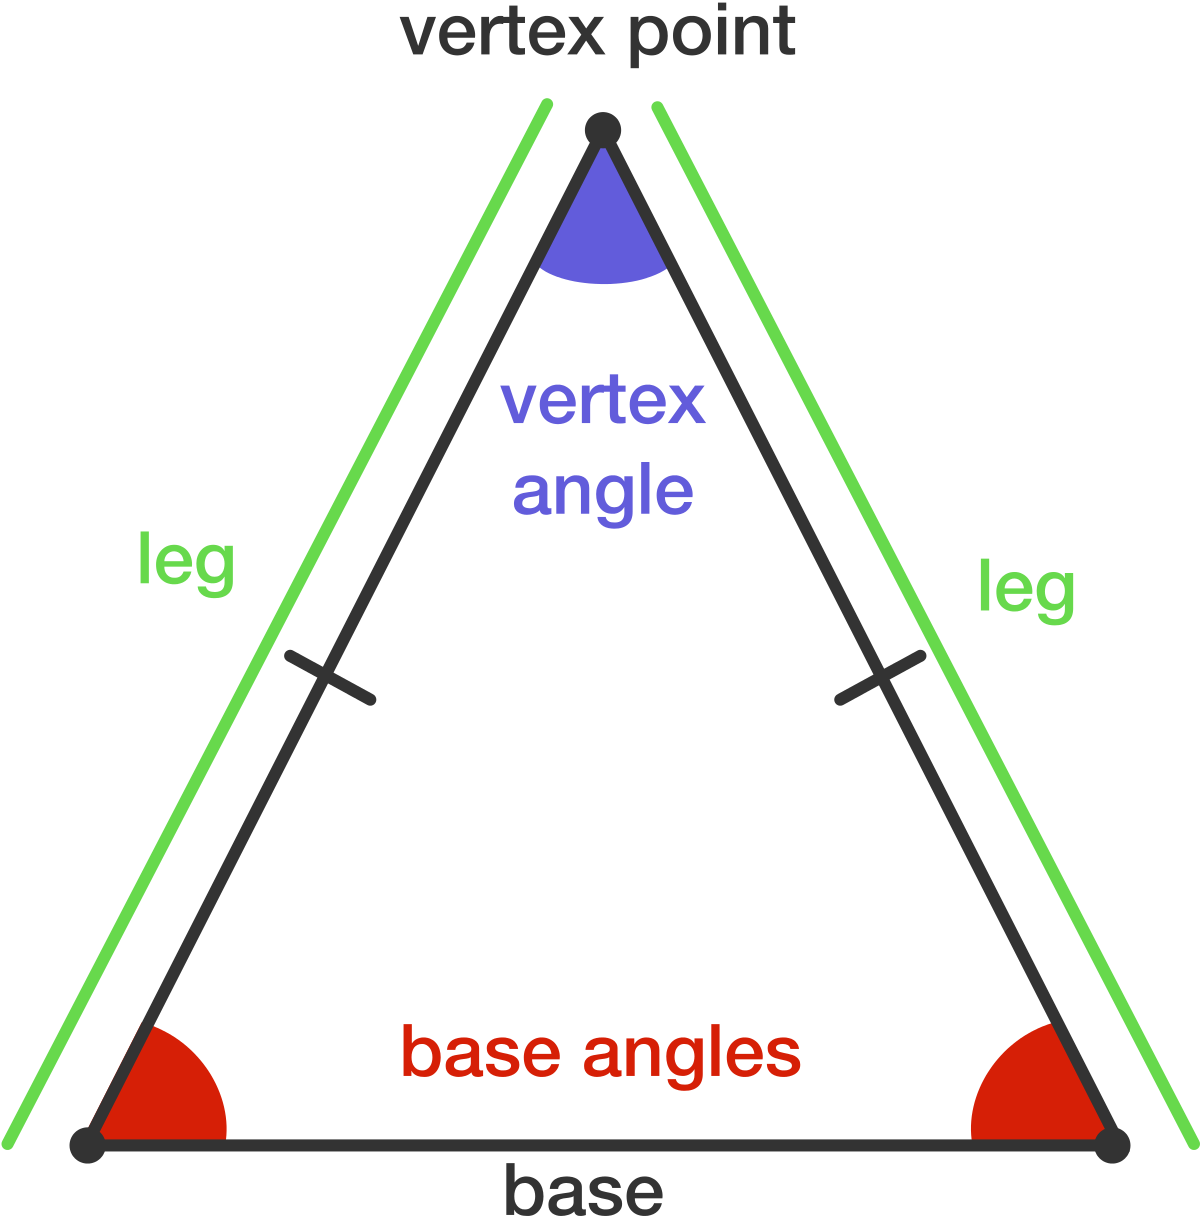 https://brilliant.org/wiki/properties-of-isosceles-triangles/